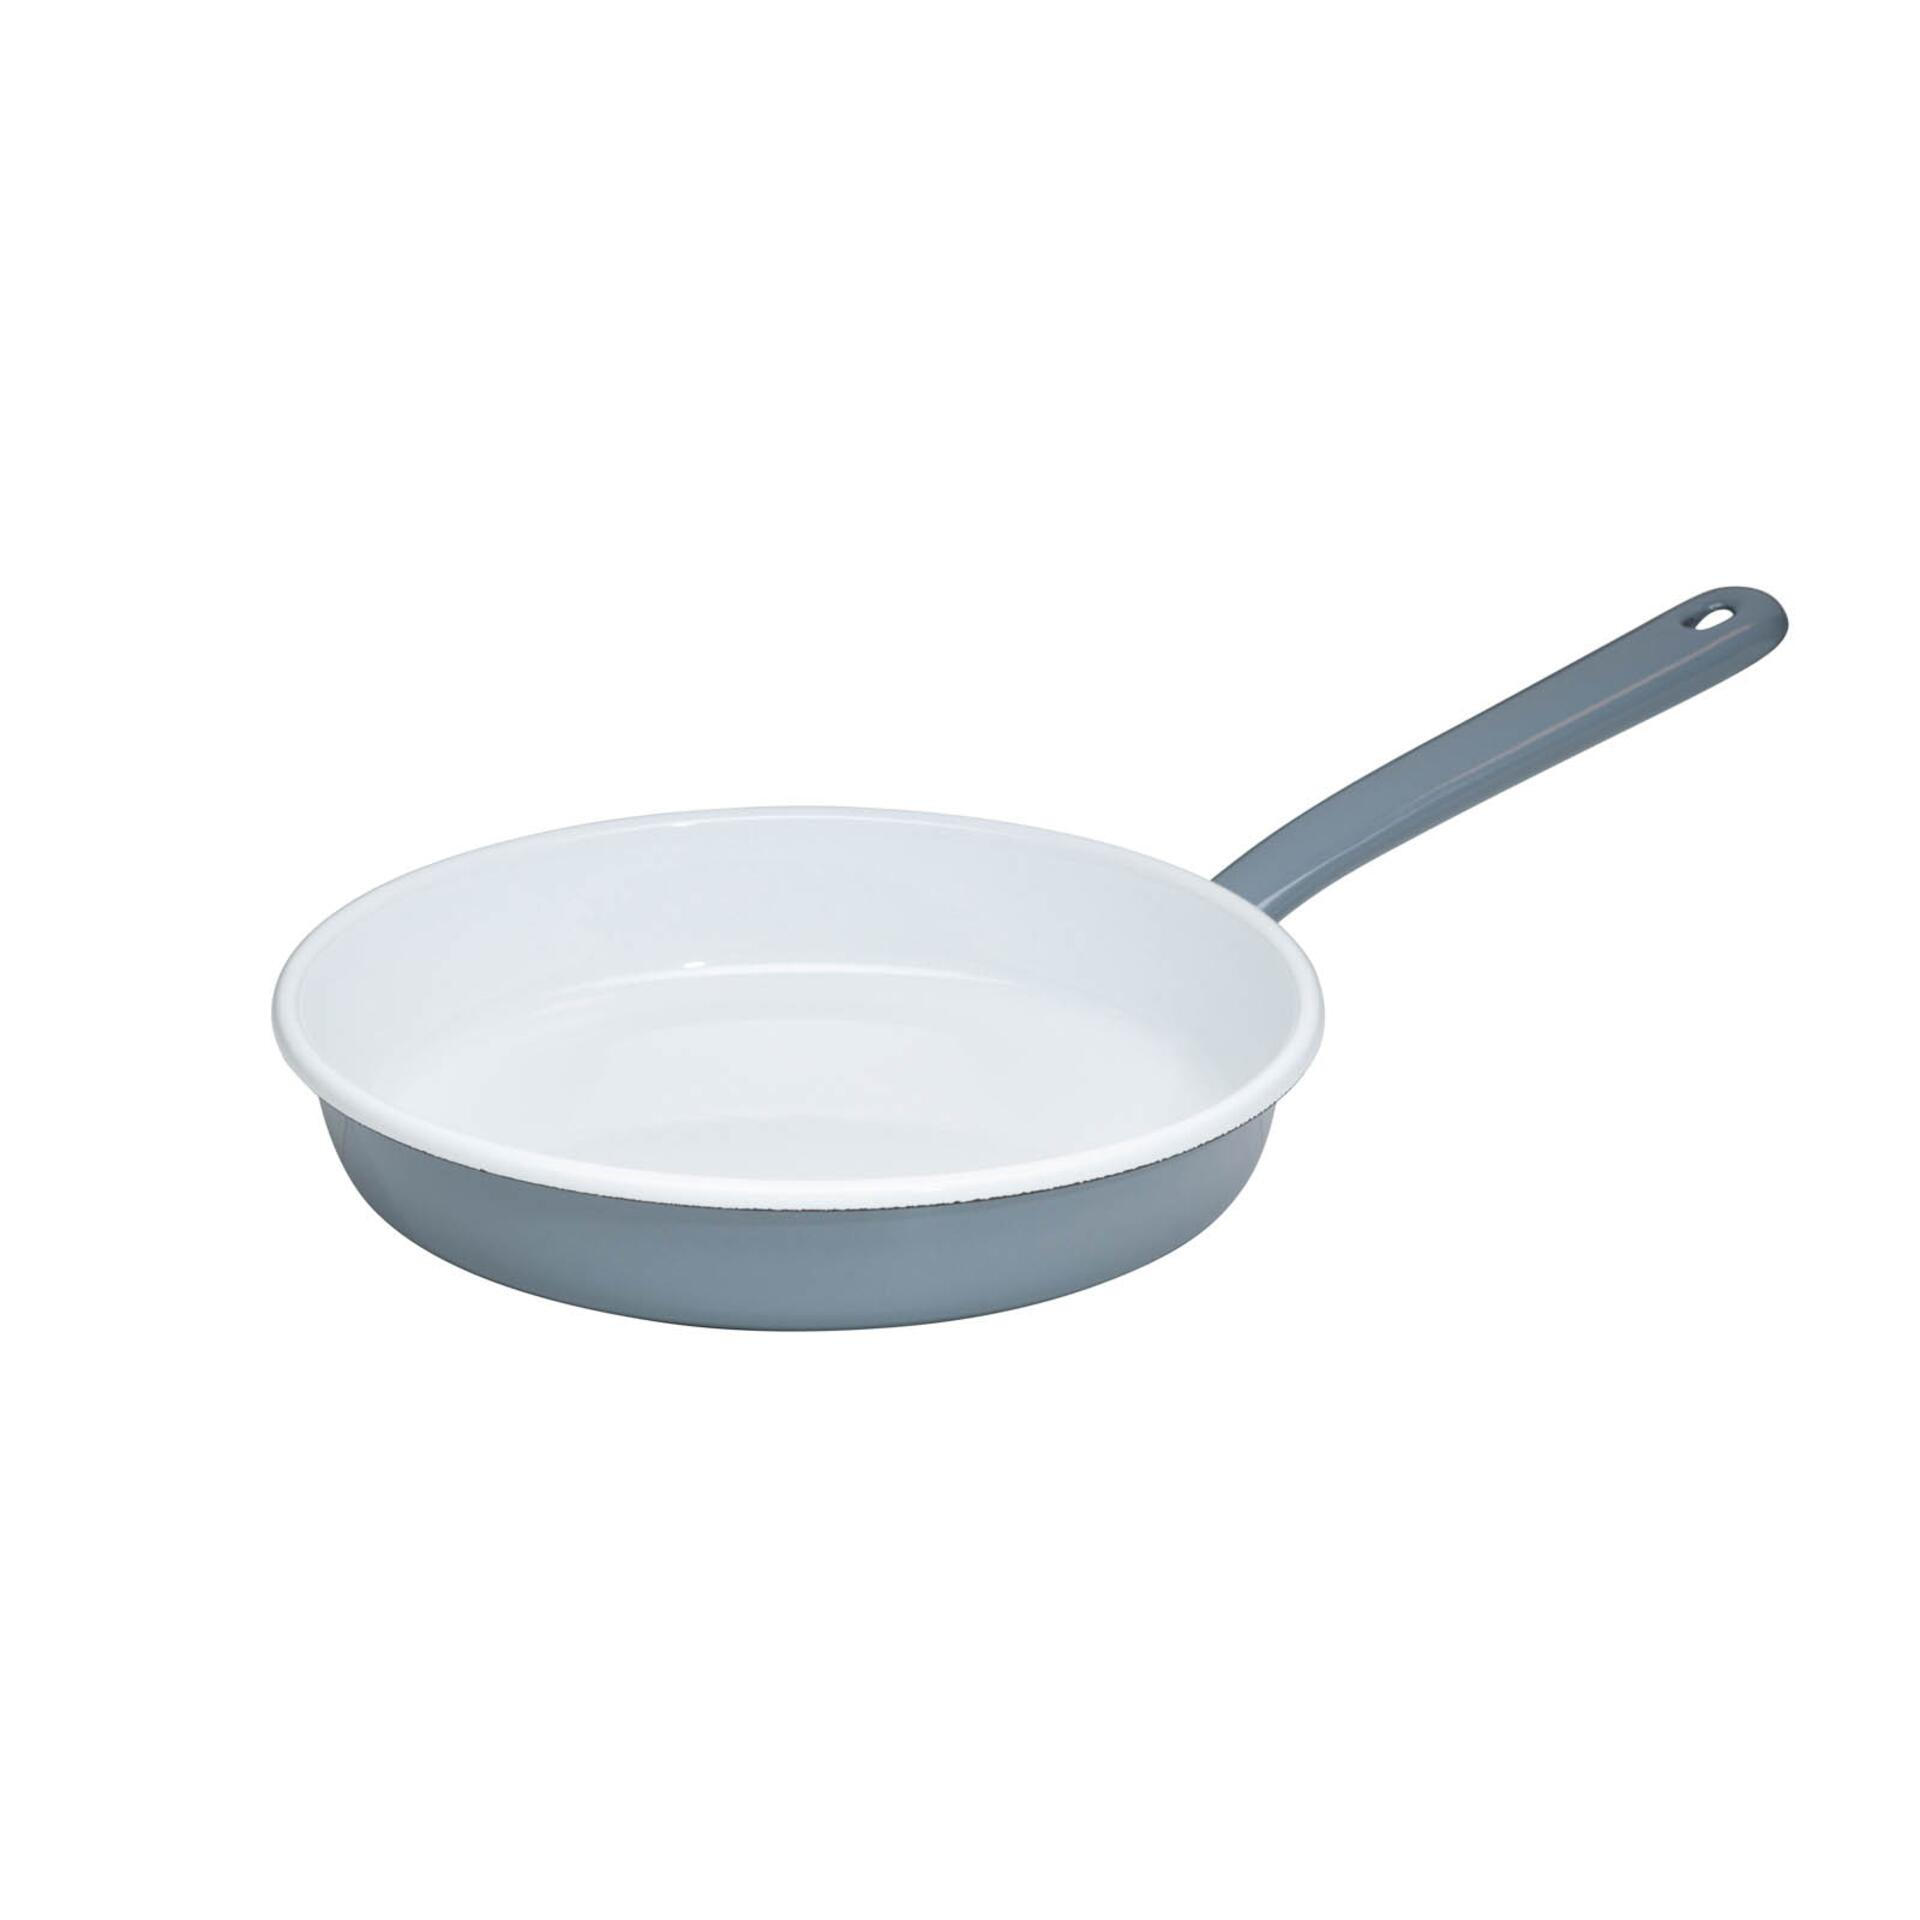 Riess Omelettpfanne 22 cm Pure Grey